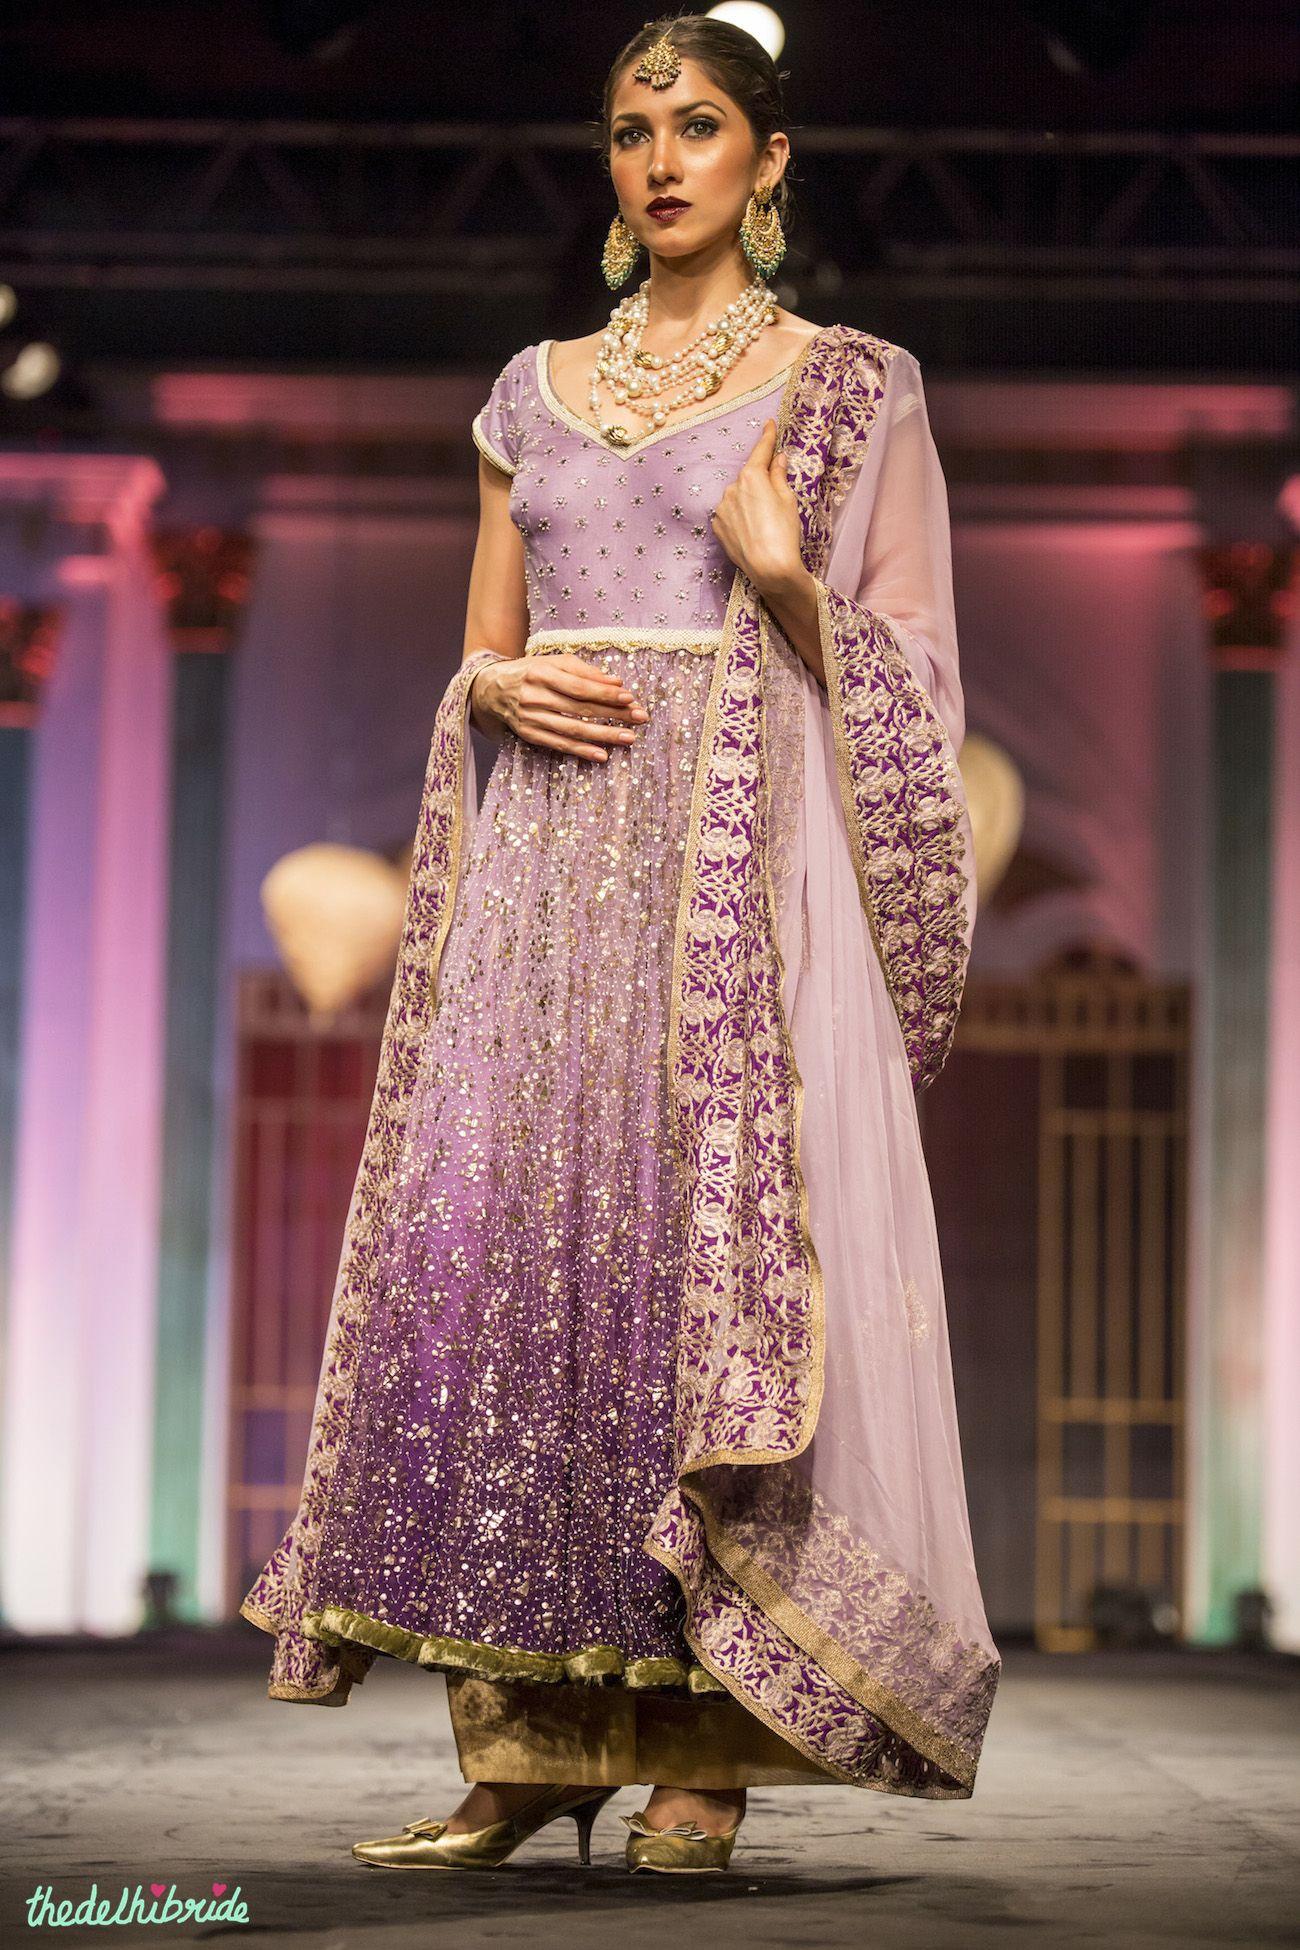 Ombre lilac Meera & Muzaffar Ali India Bridal Fashion Week 2014 ...